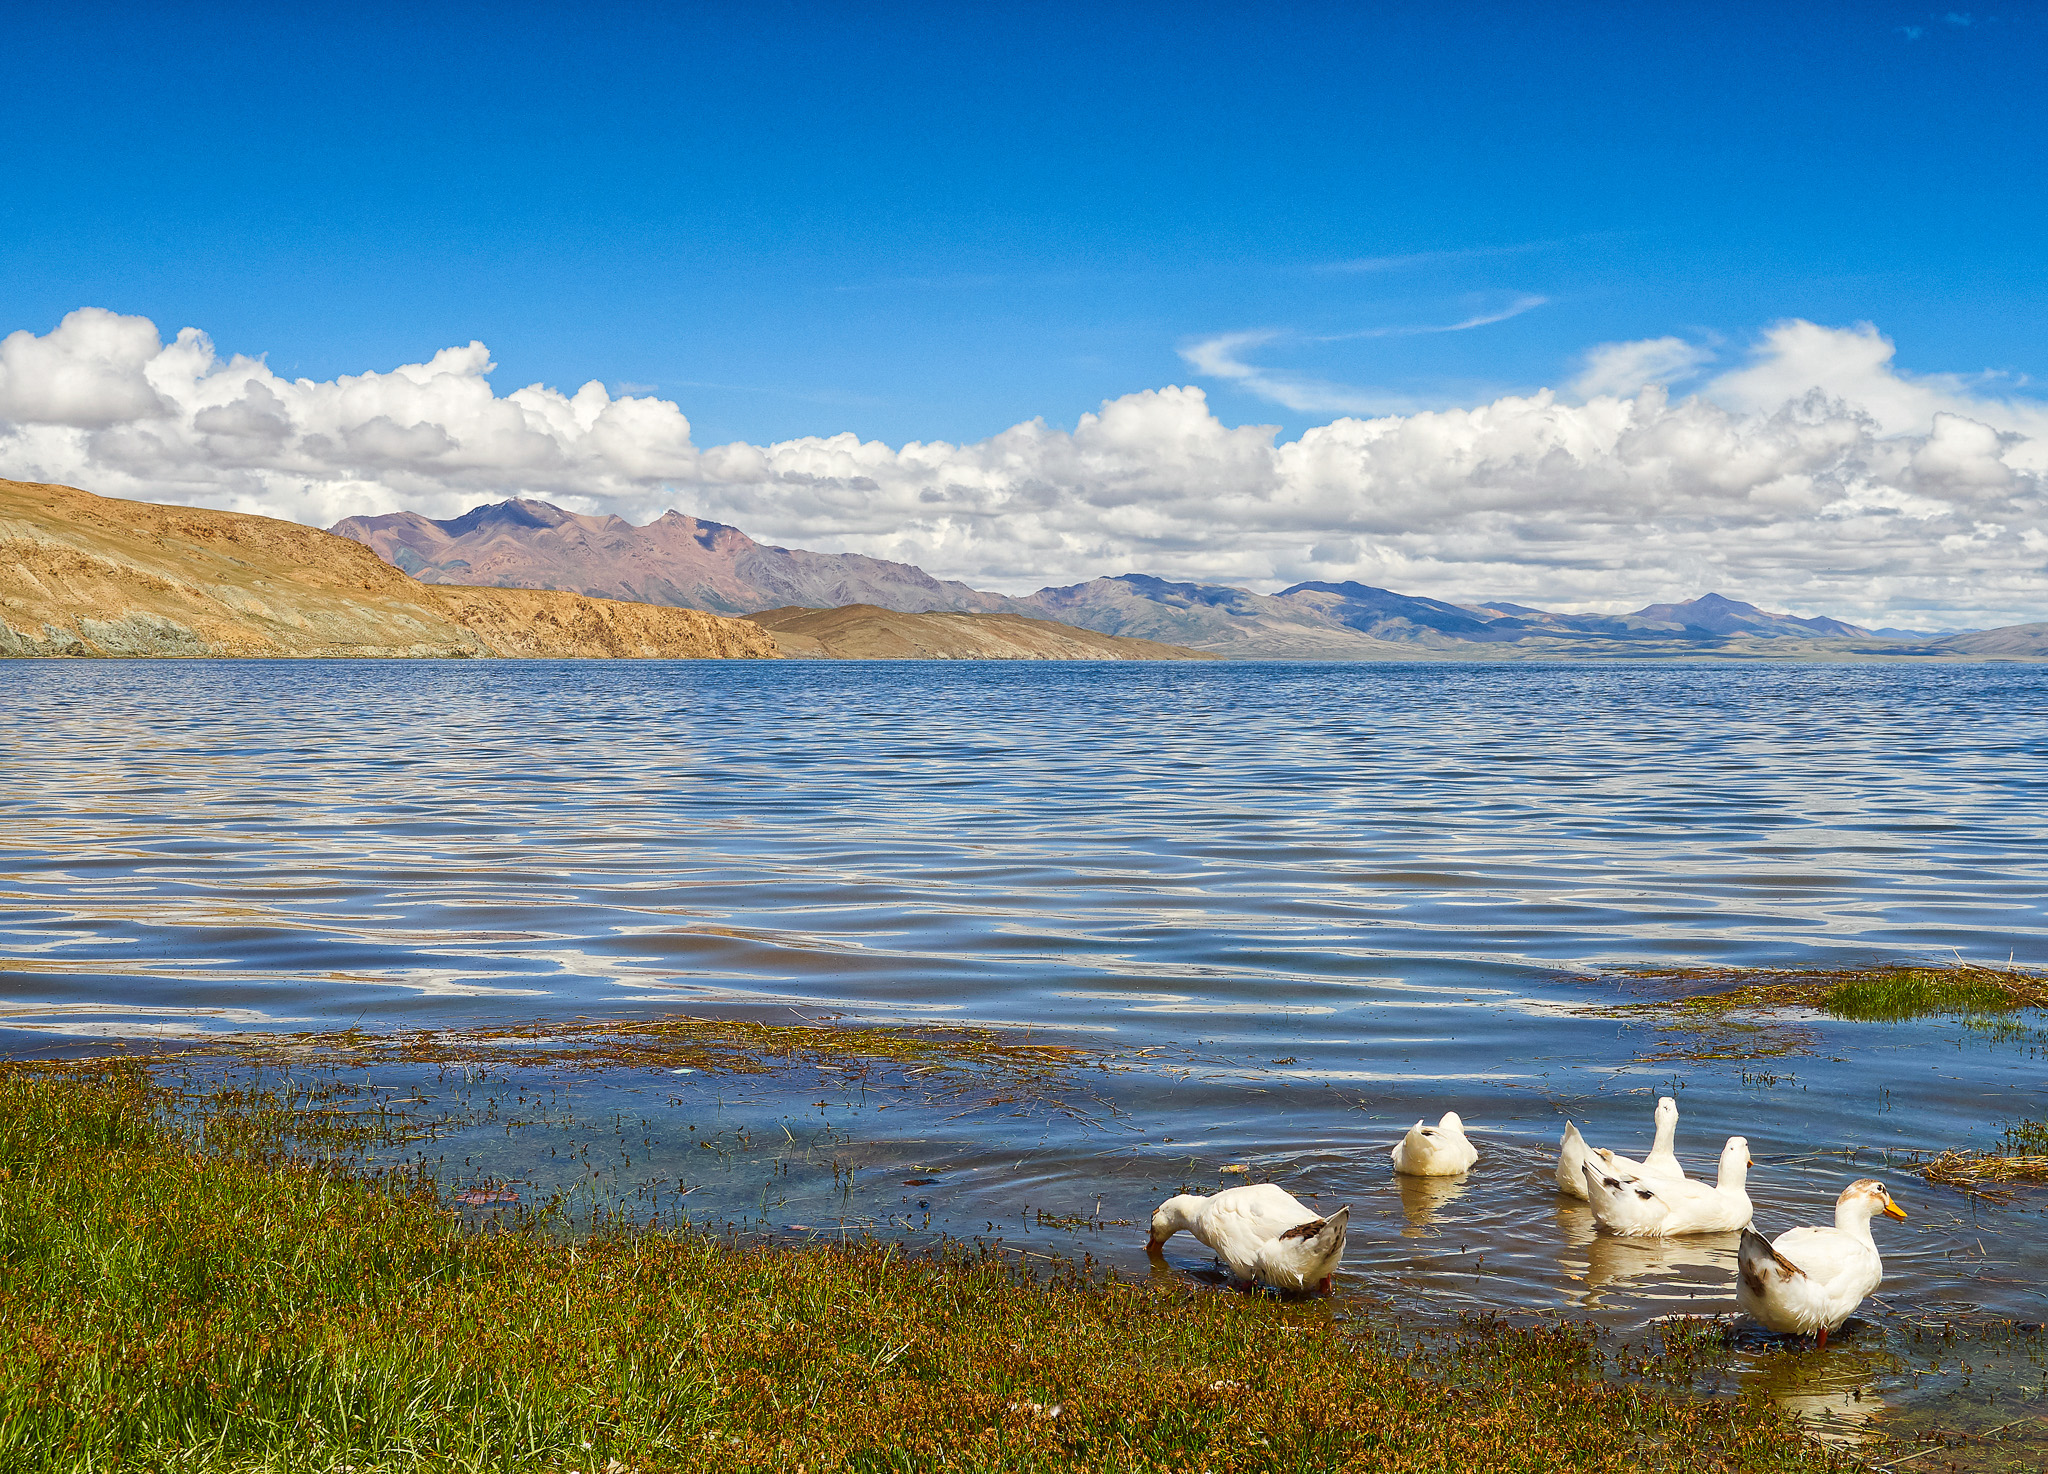 A flock of swans at the high altitude freshwater Lake Manasarovar, Tibet